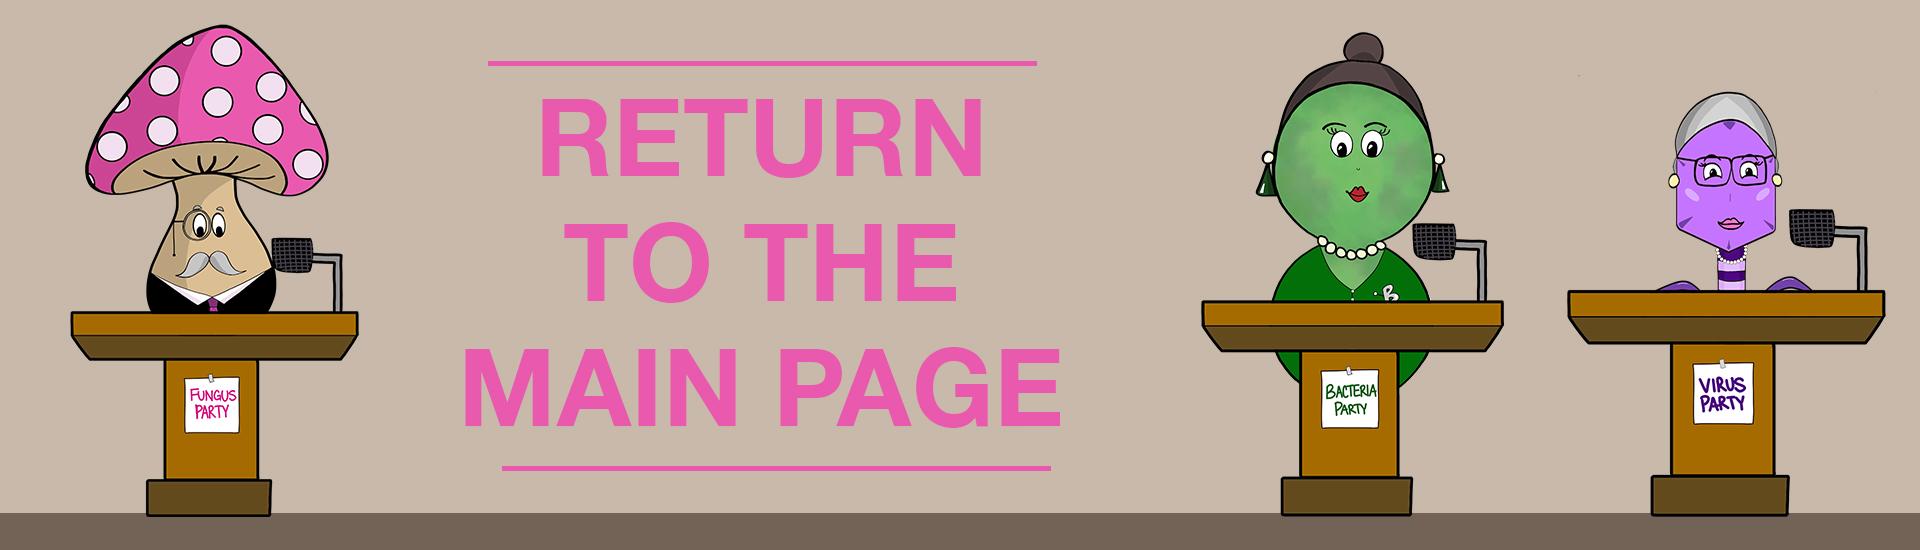 Fungi - Return to the Main Page